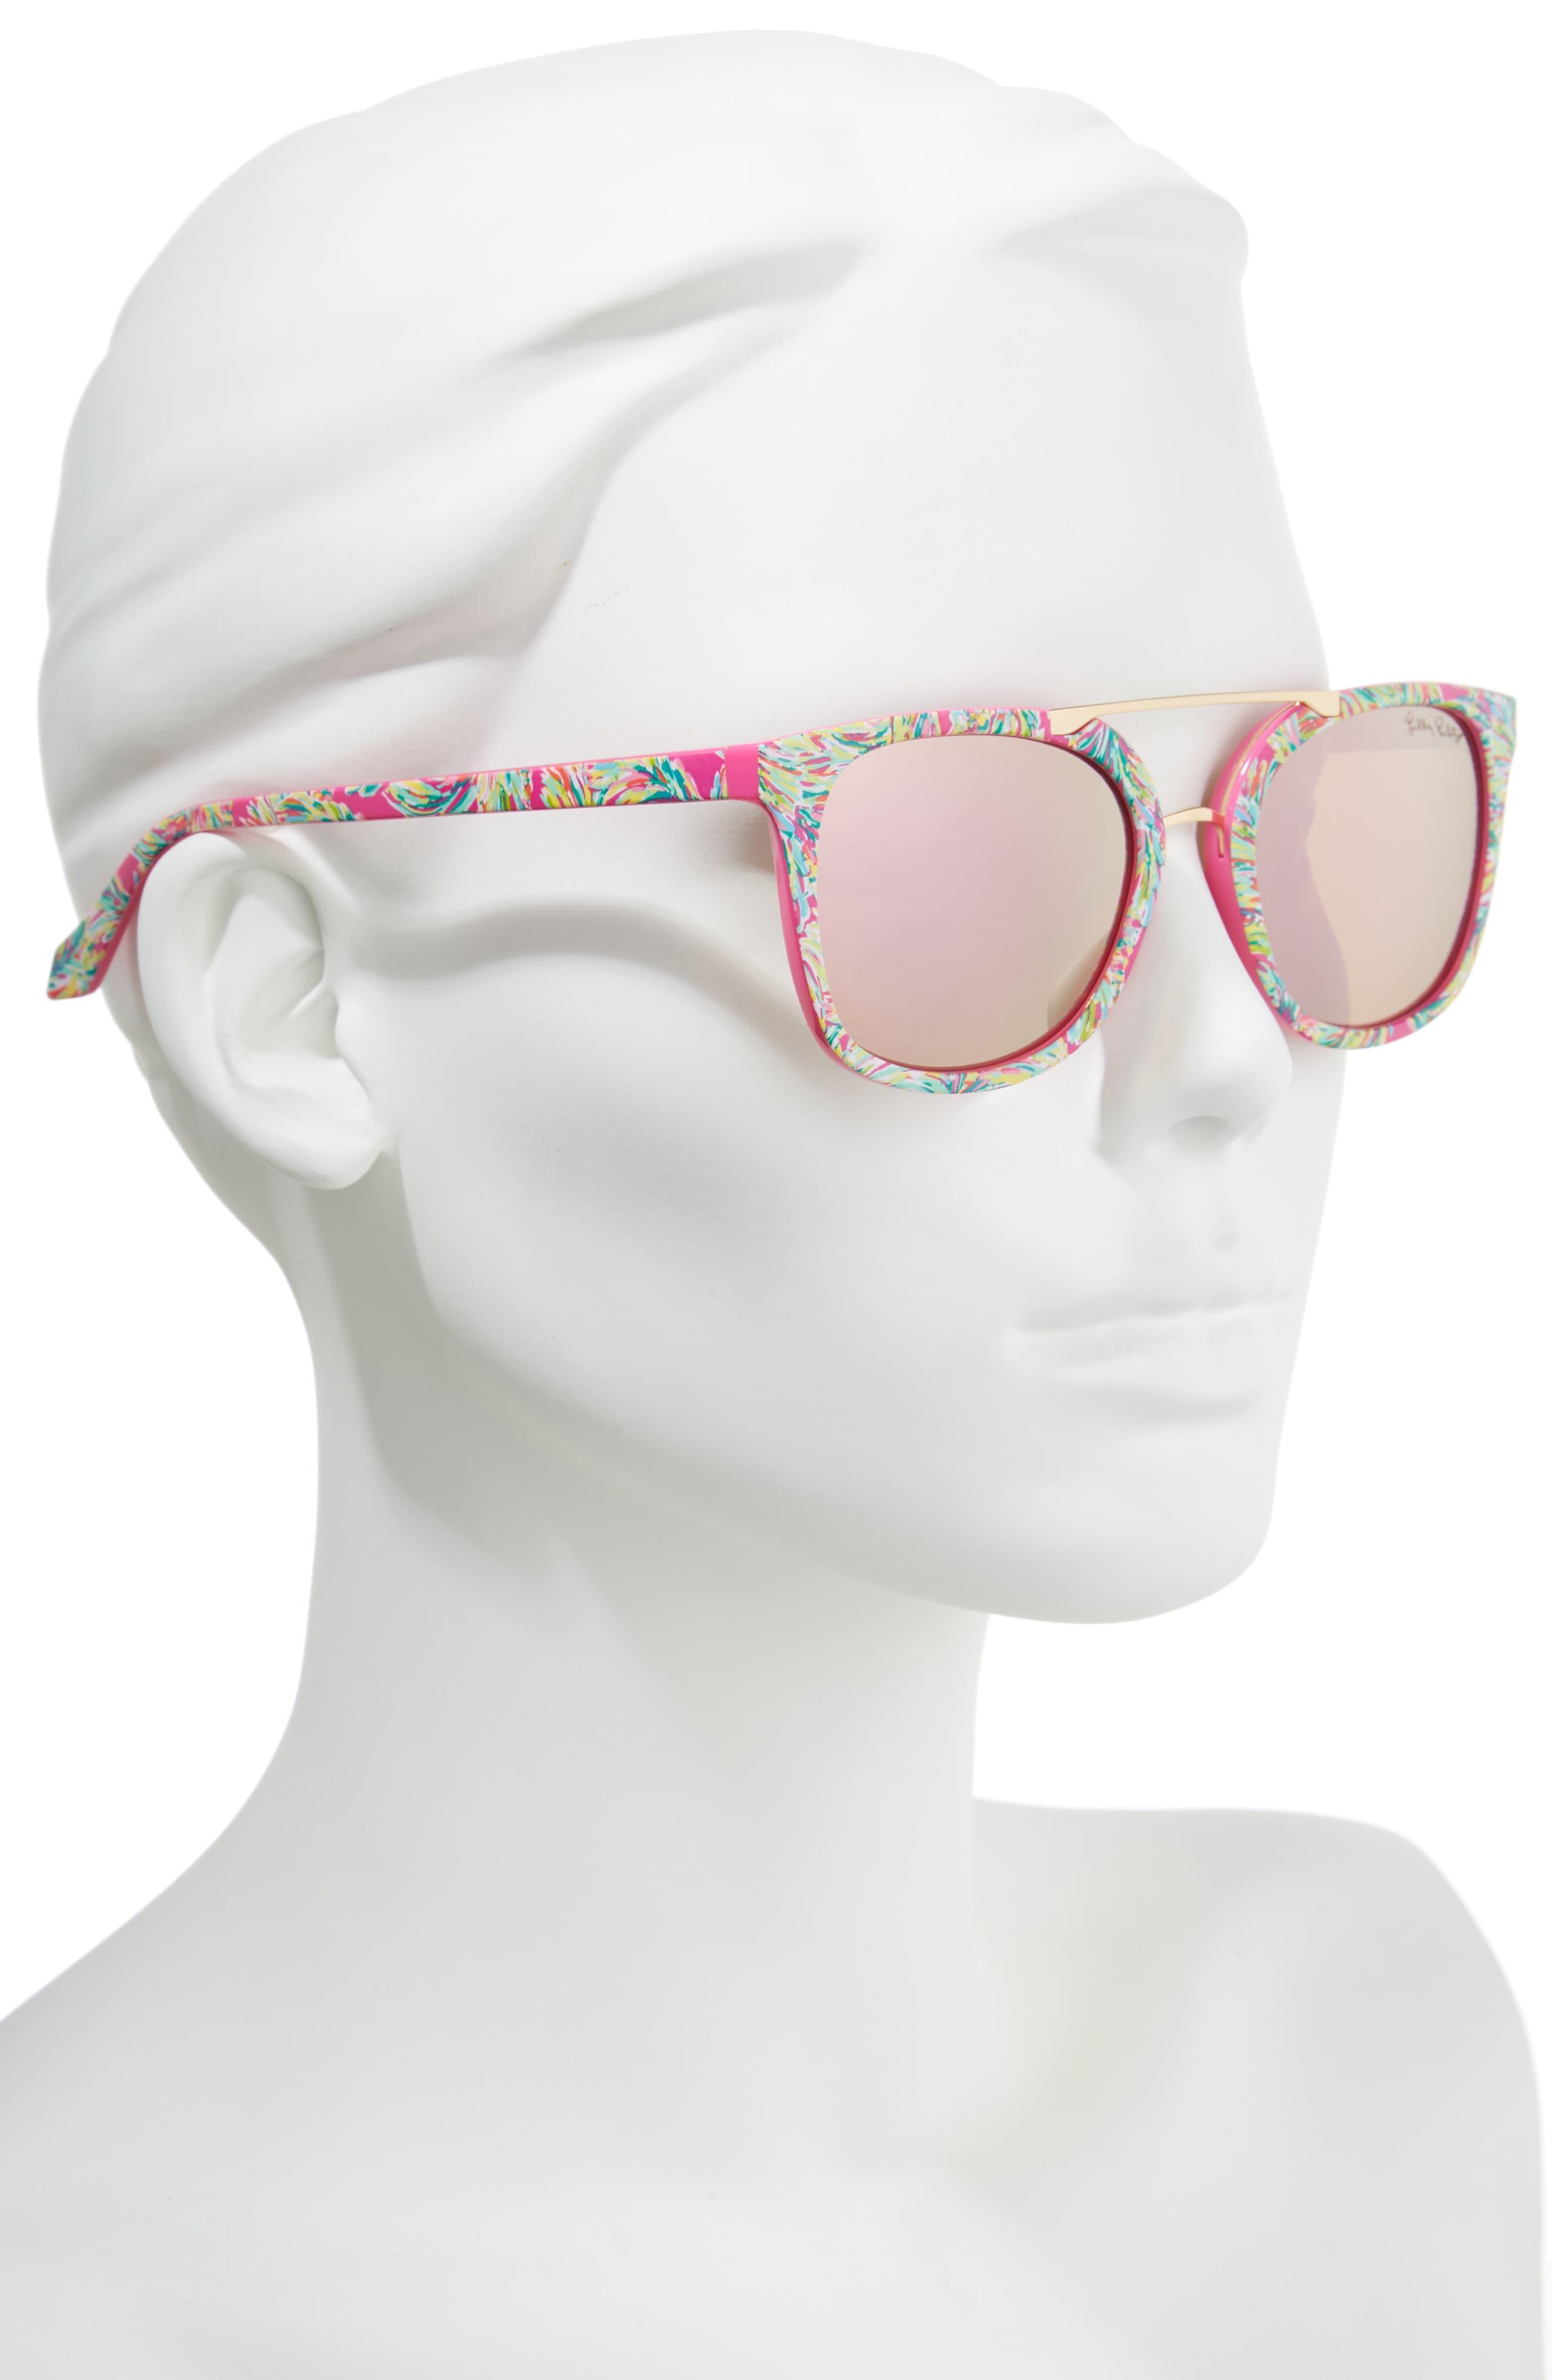 Lilly Pulitzer Emilia 53mm Polarized Sunglasses,                             Alternate thumbnail 2, color,                             Shady Lady/ Pink